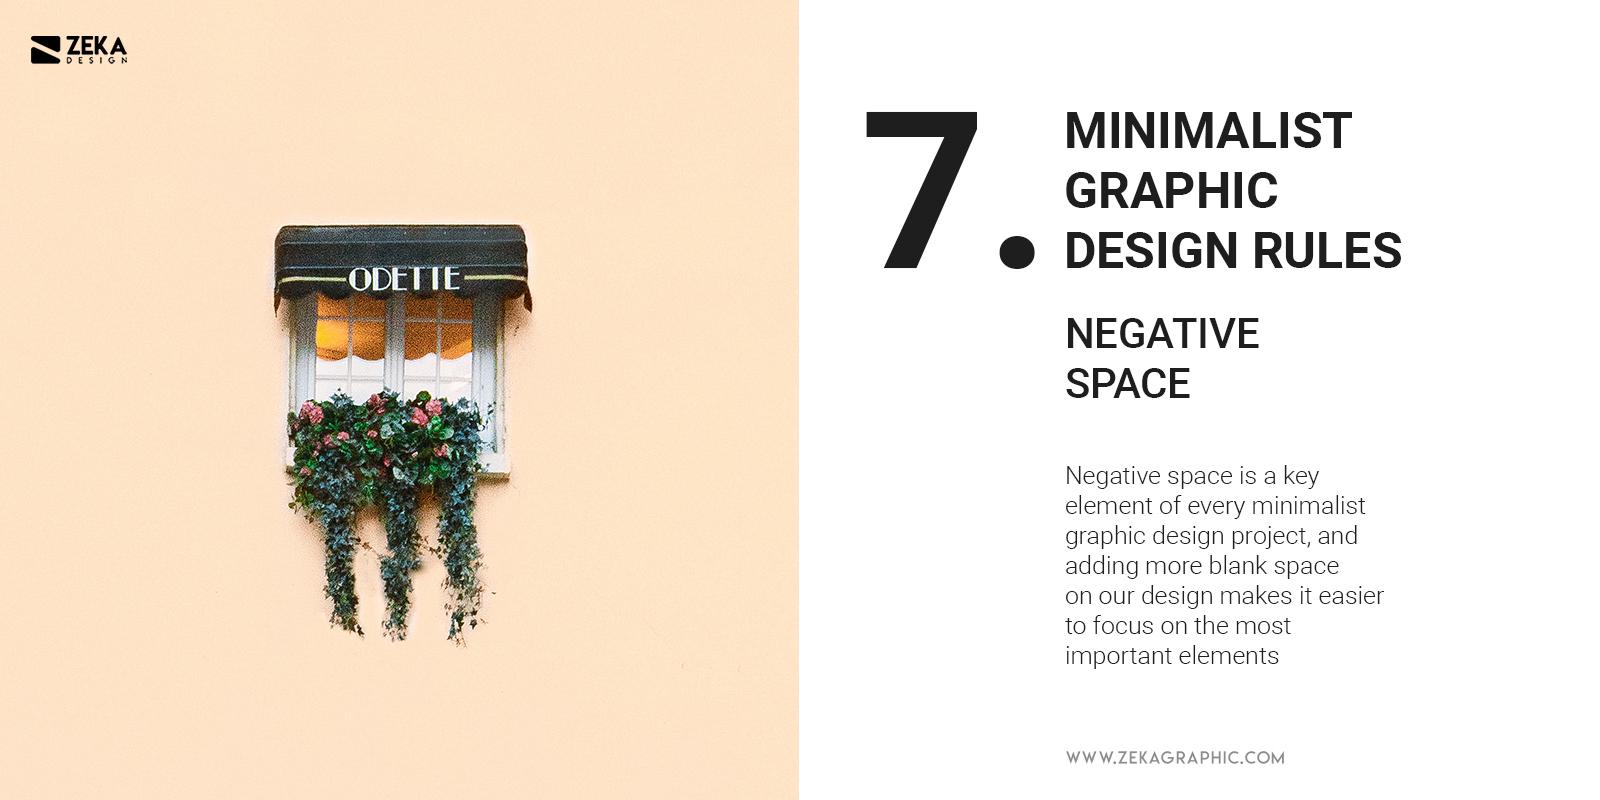 7 Minimalist Graphic Design Rules Negative Space